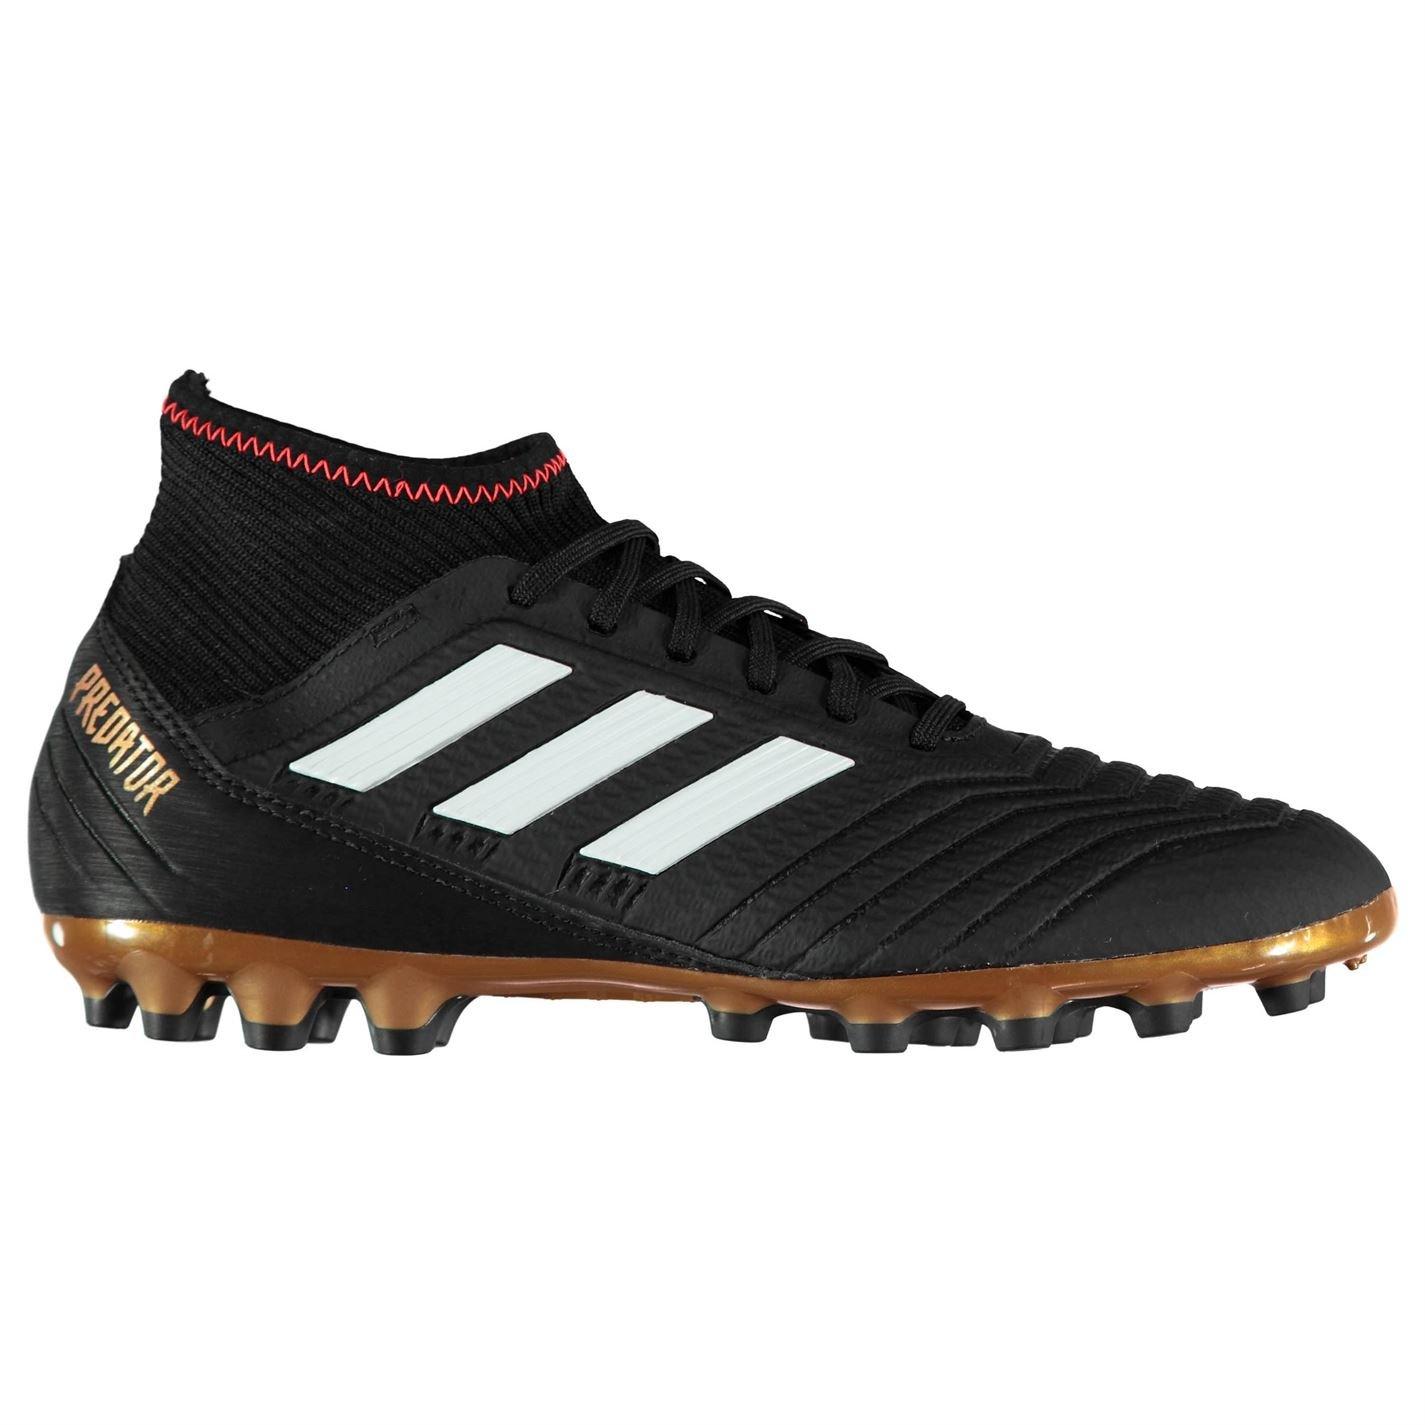 finest selection 4b117 d32bb ... blanco rojo fútbol zapatillas 8541b 2fe47  50% off low price adidas  predator 18.3 ag j j botas de 18.3 fútbol unisex ag